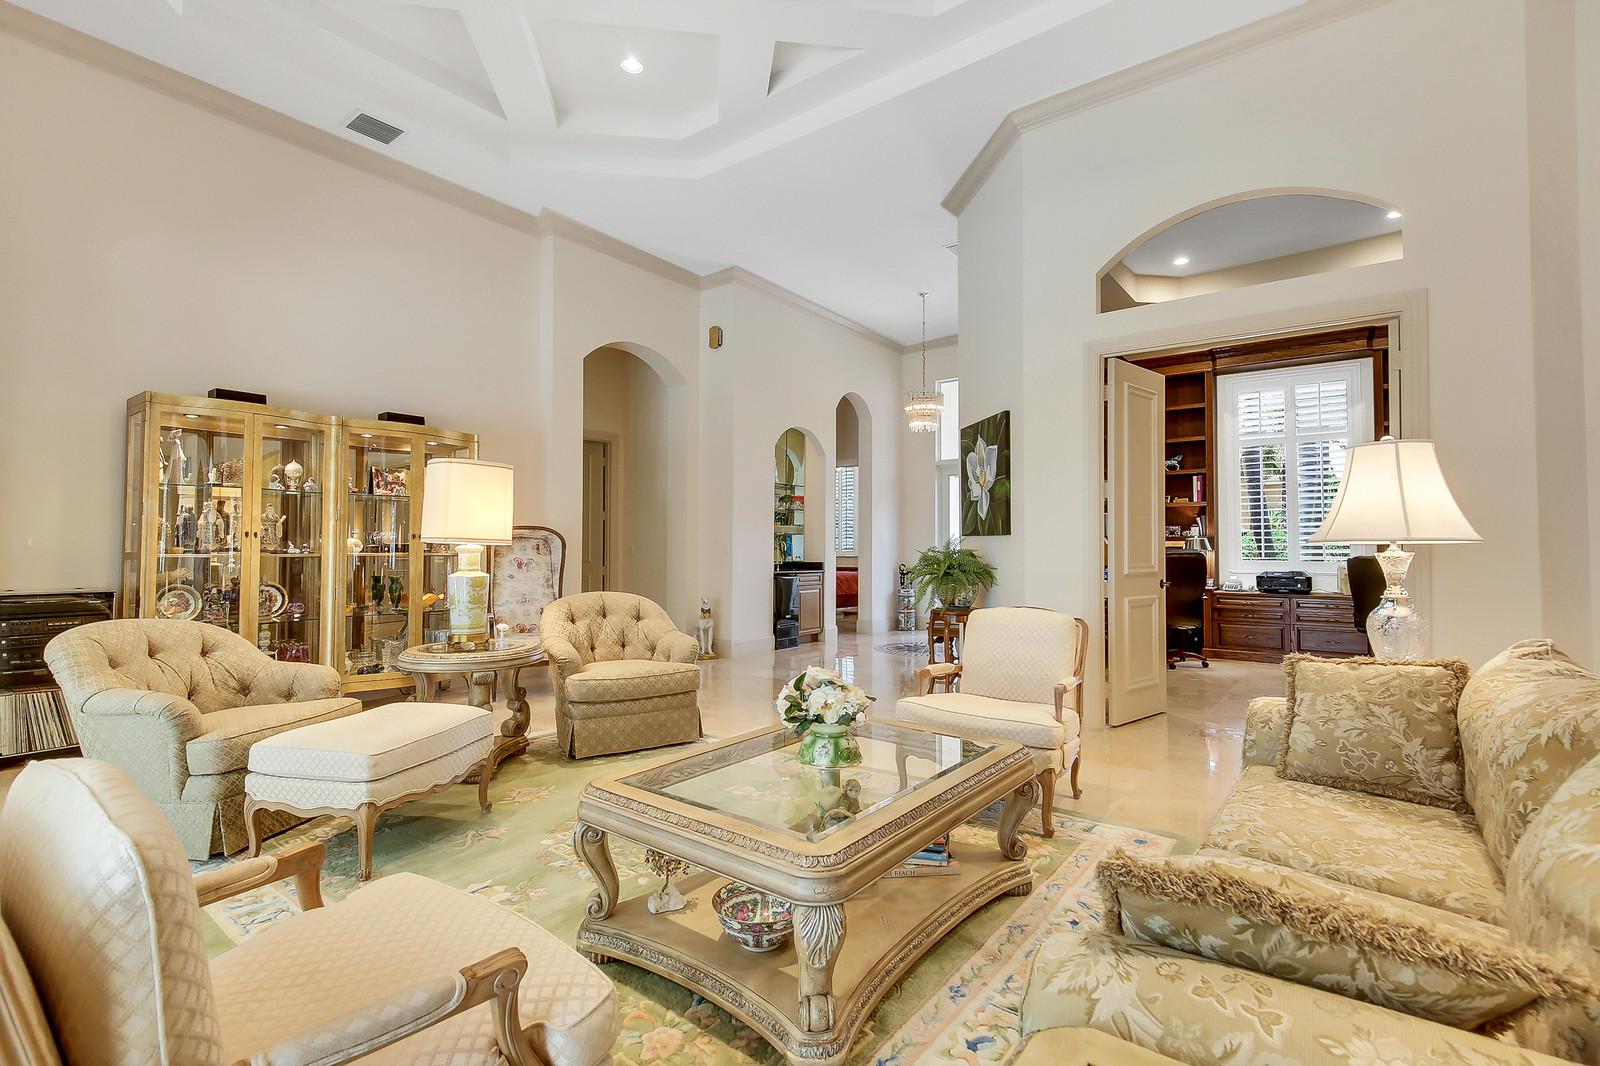 1120 San Michele Way, Palm Beach Gardens, Florida 33418, 4 Bedrooms Bedrooms, ,5.1 BathroomsBathrooms,Single Family,For Sale,San Michele,San Michele,RX-10436095